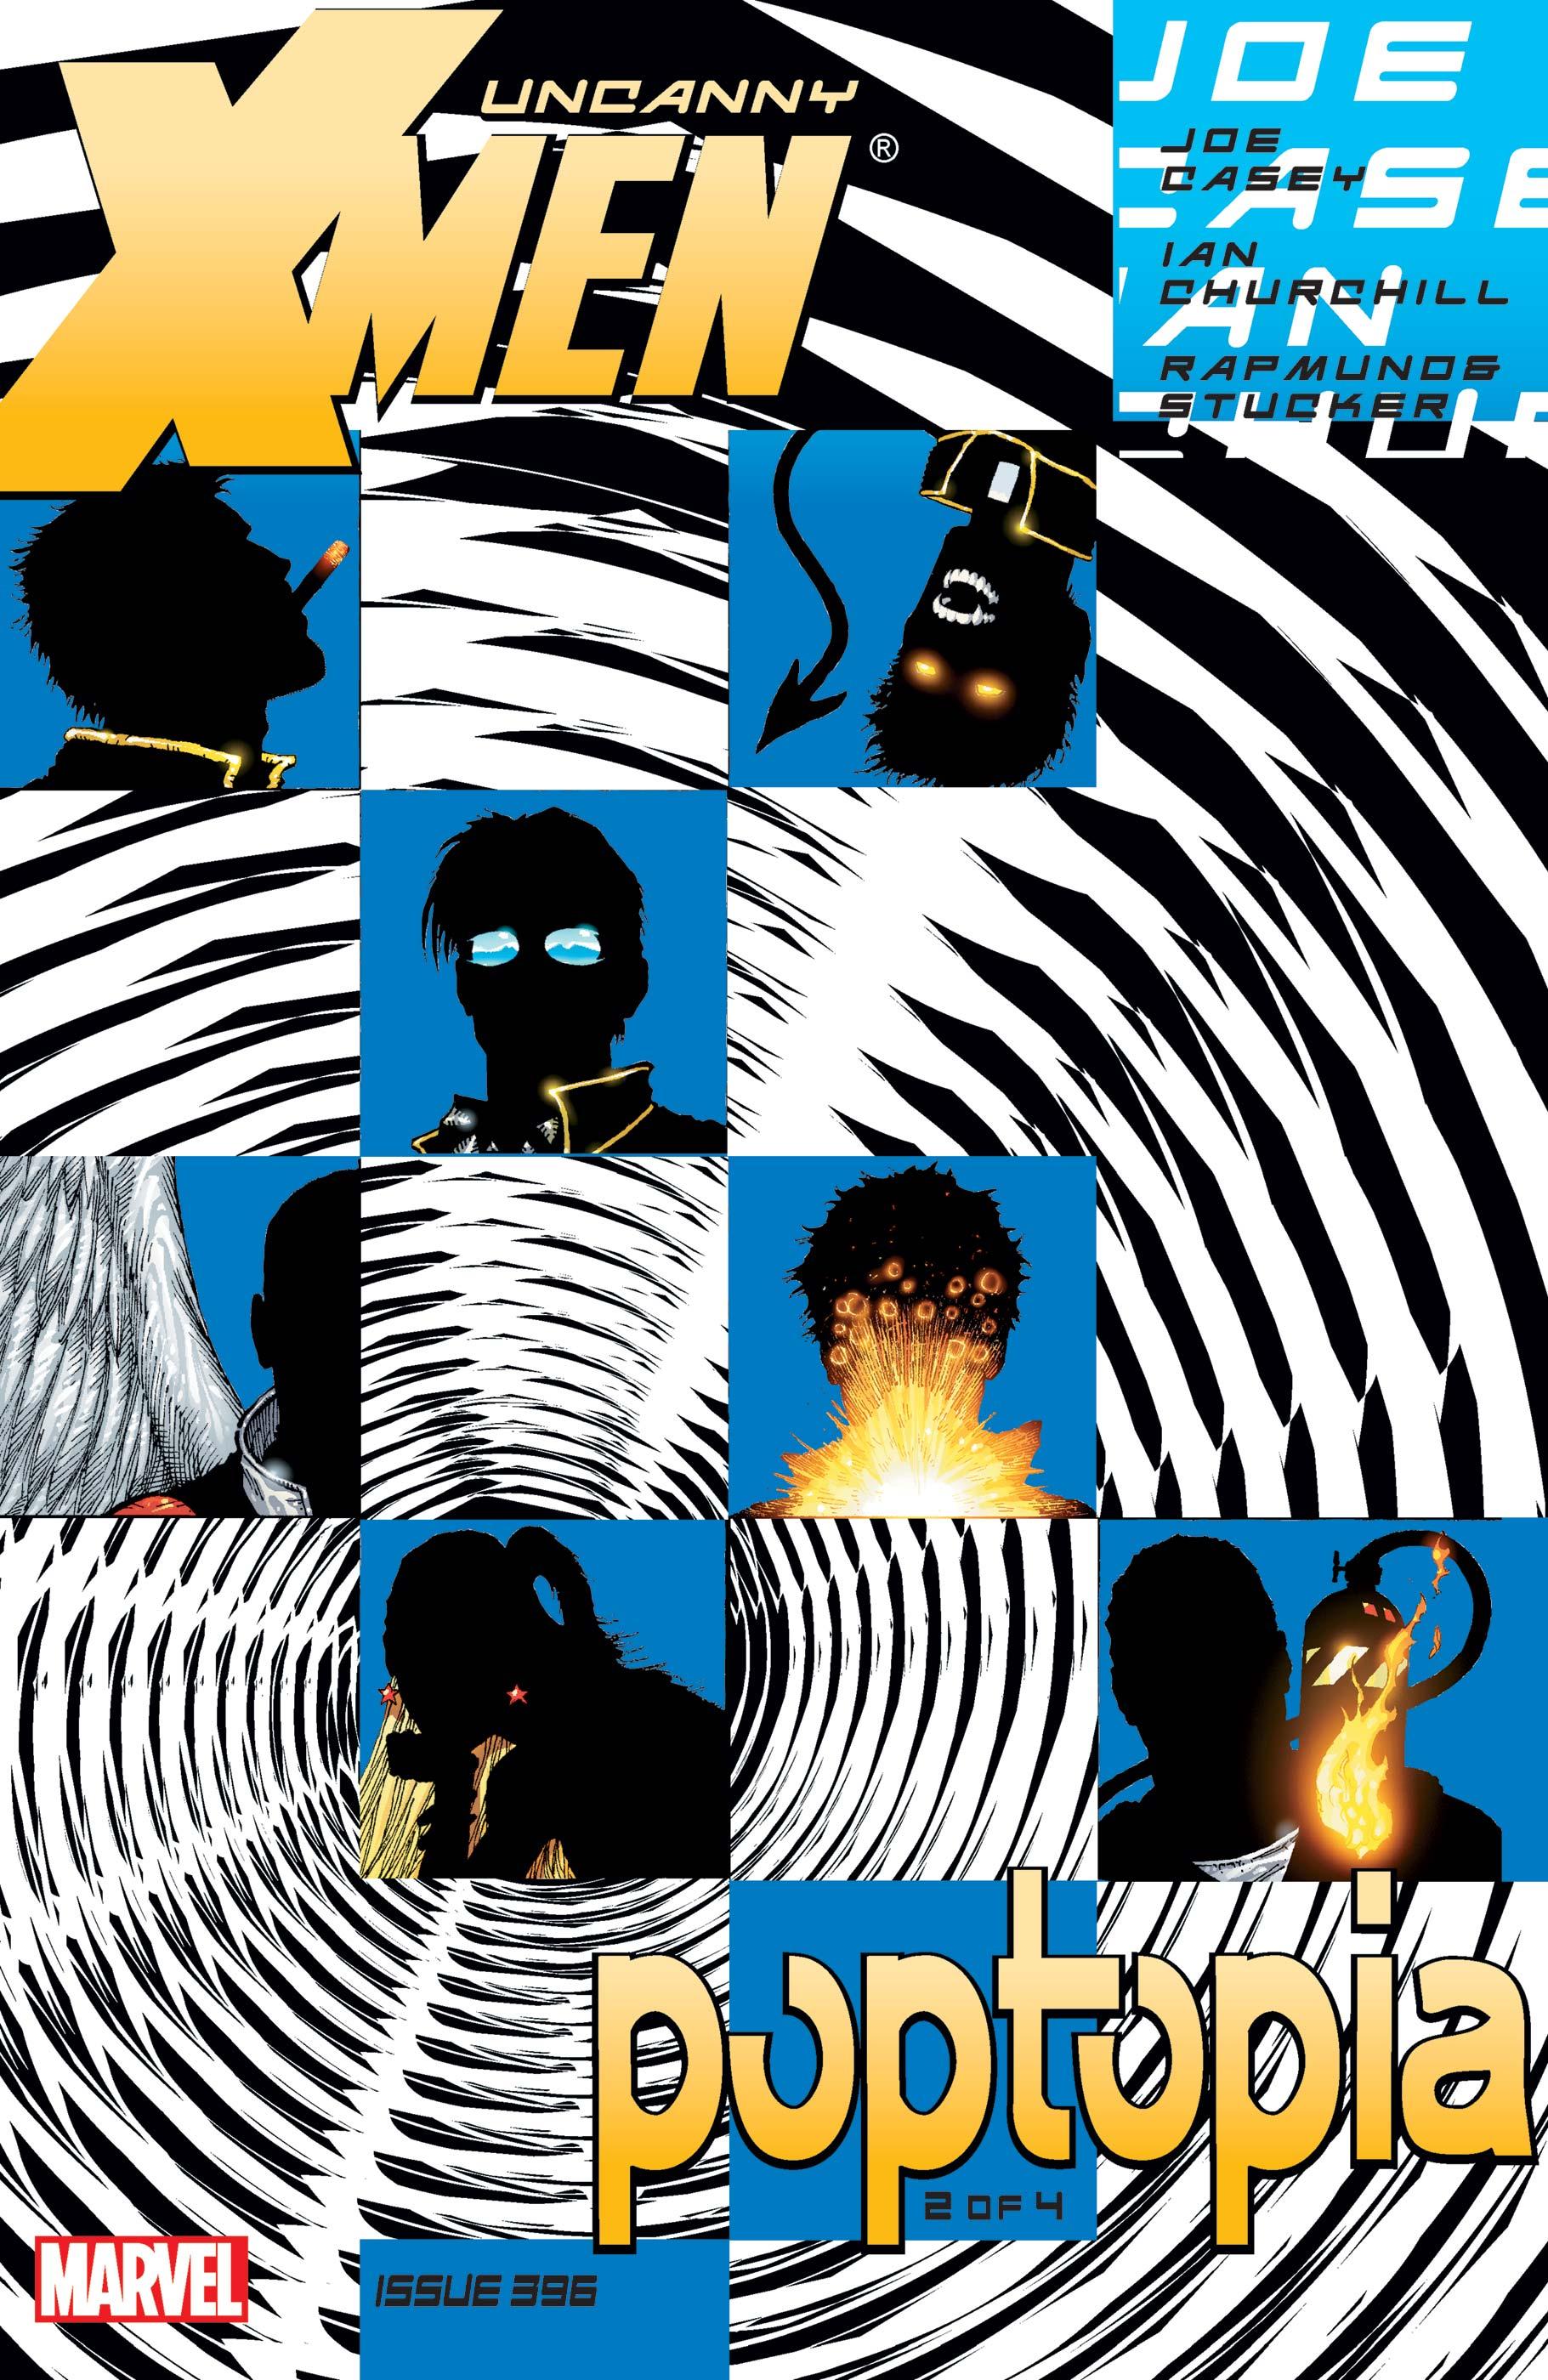 Uncanny X-Men (1963) #396